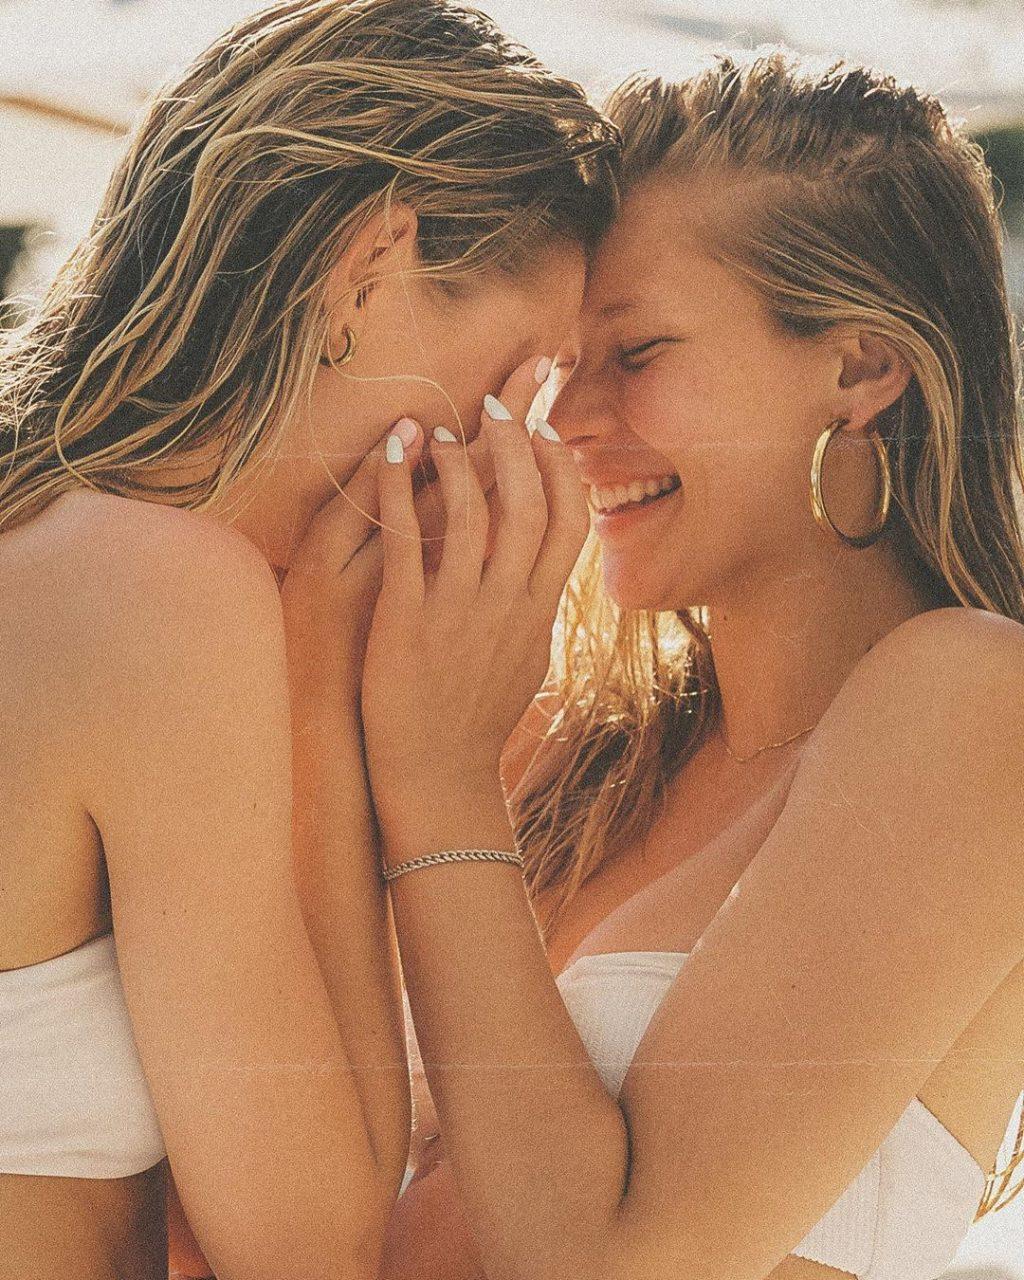 Josie Canseco & Scarlett Leithold Nude & Sexy (12 Photos)